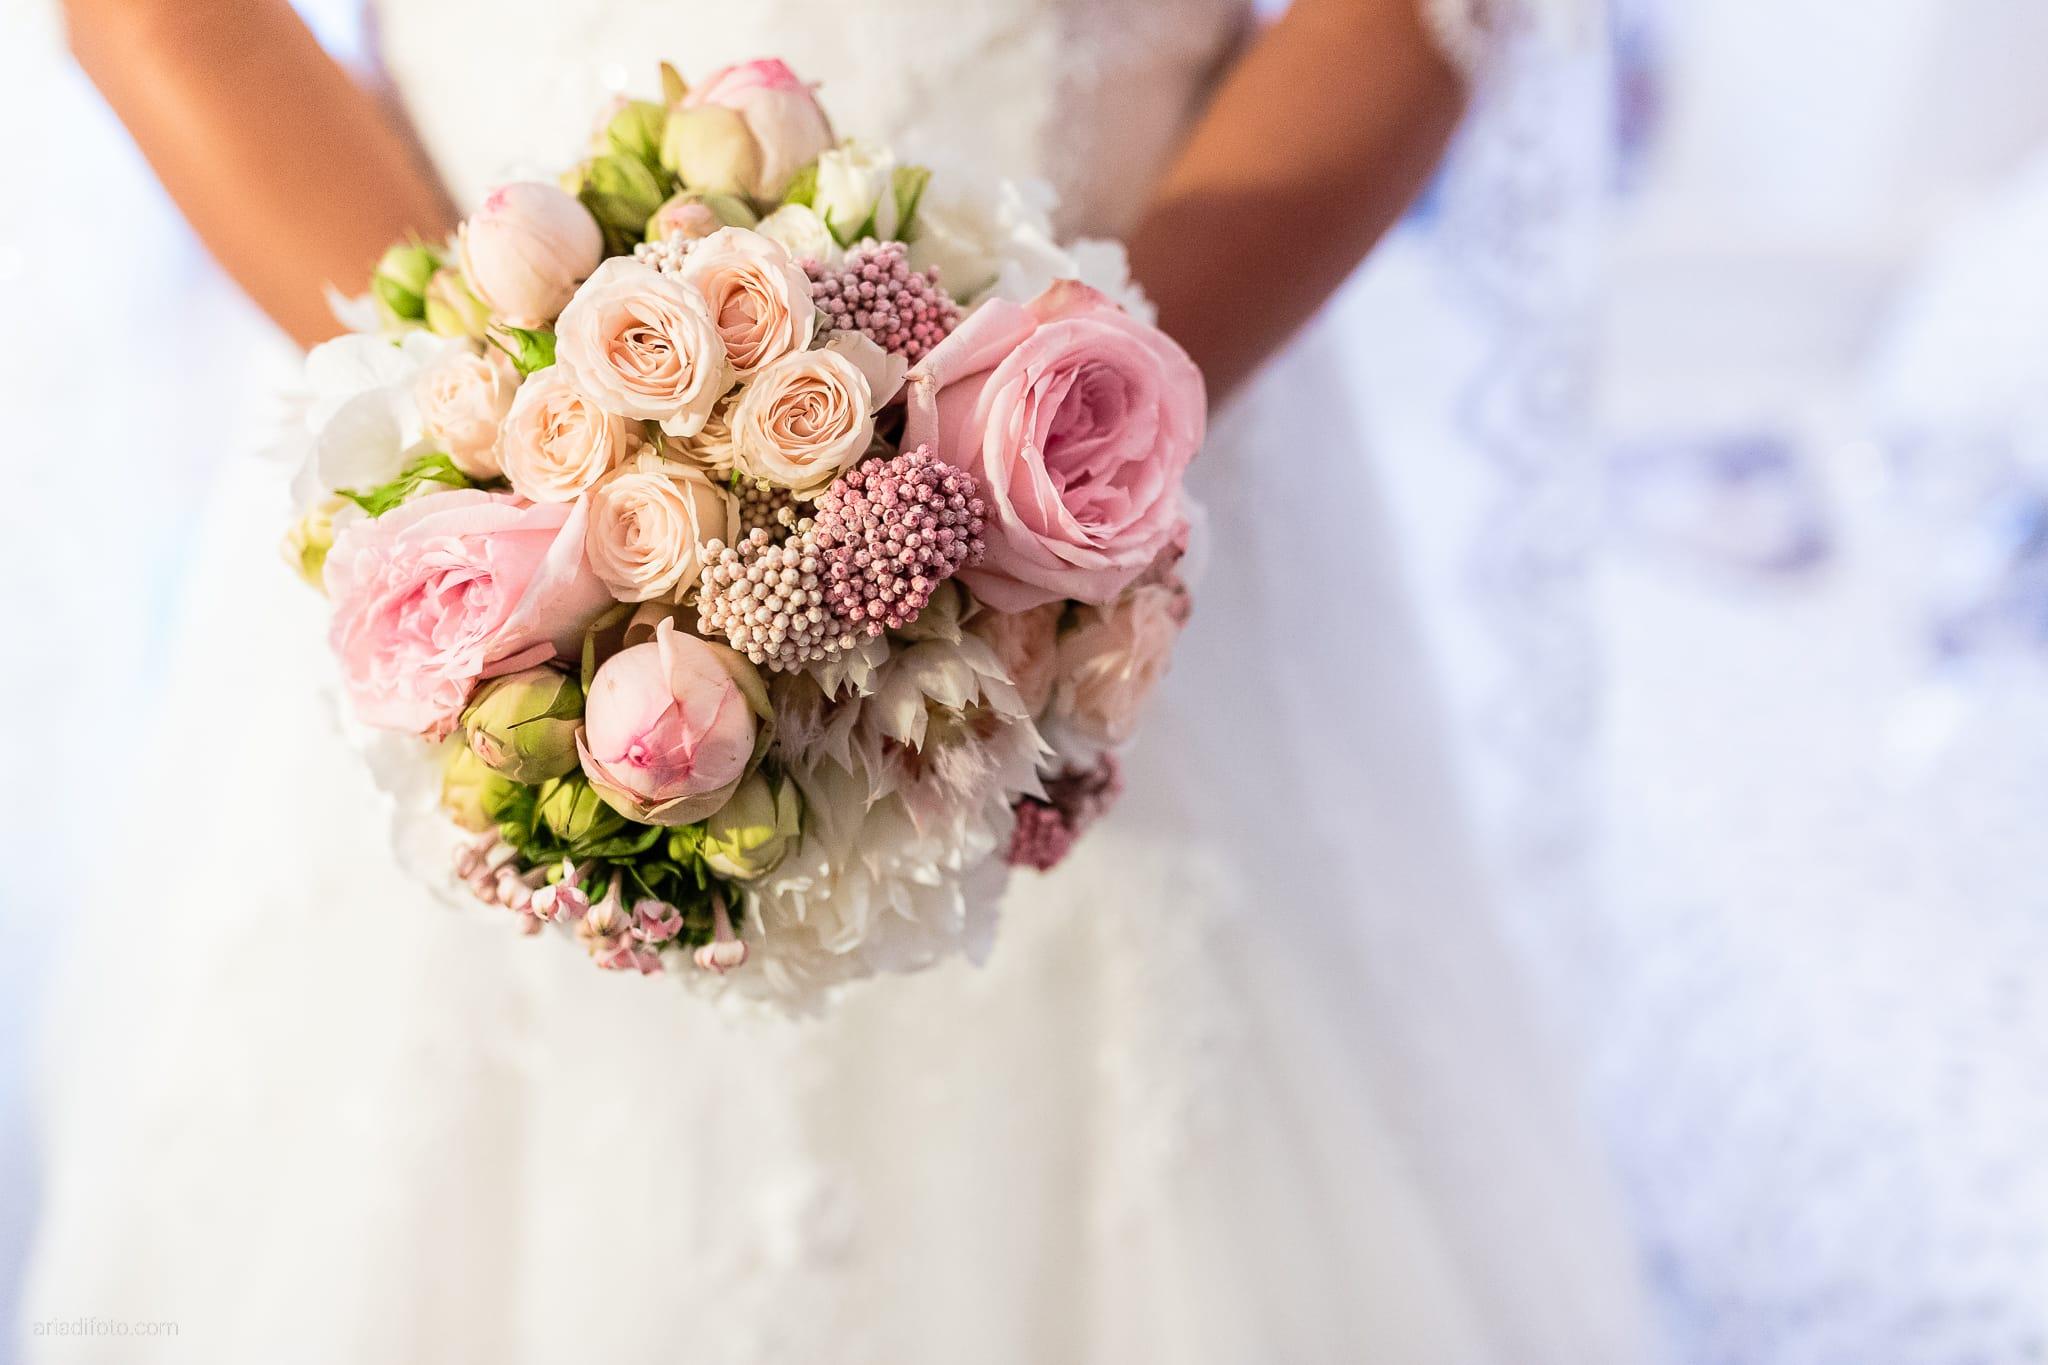 Giorgia Davide Matrimonio Villa Revoltella Salvia Rosmarino Trieste preparativi dettagli bouquet rose